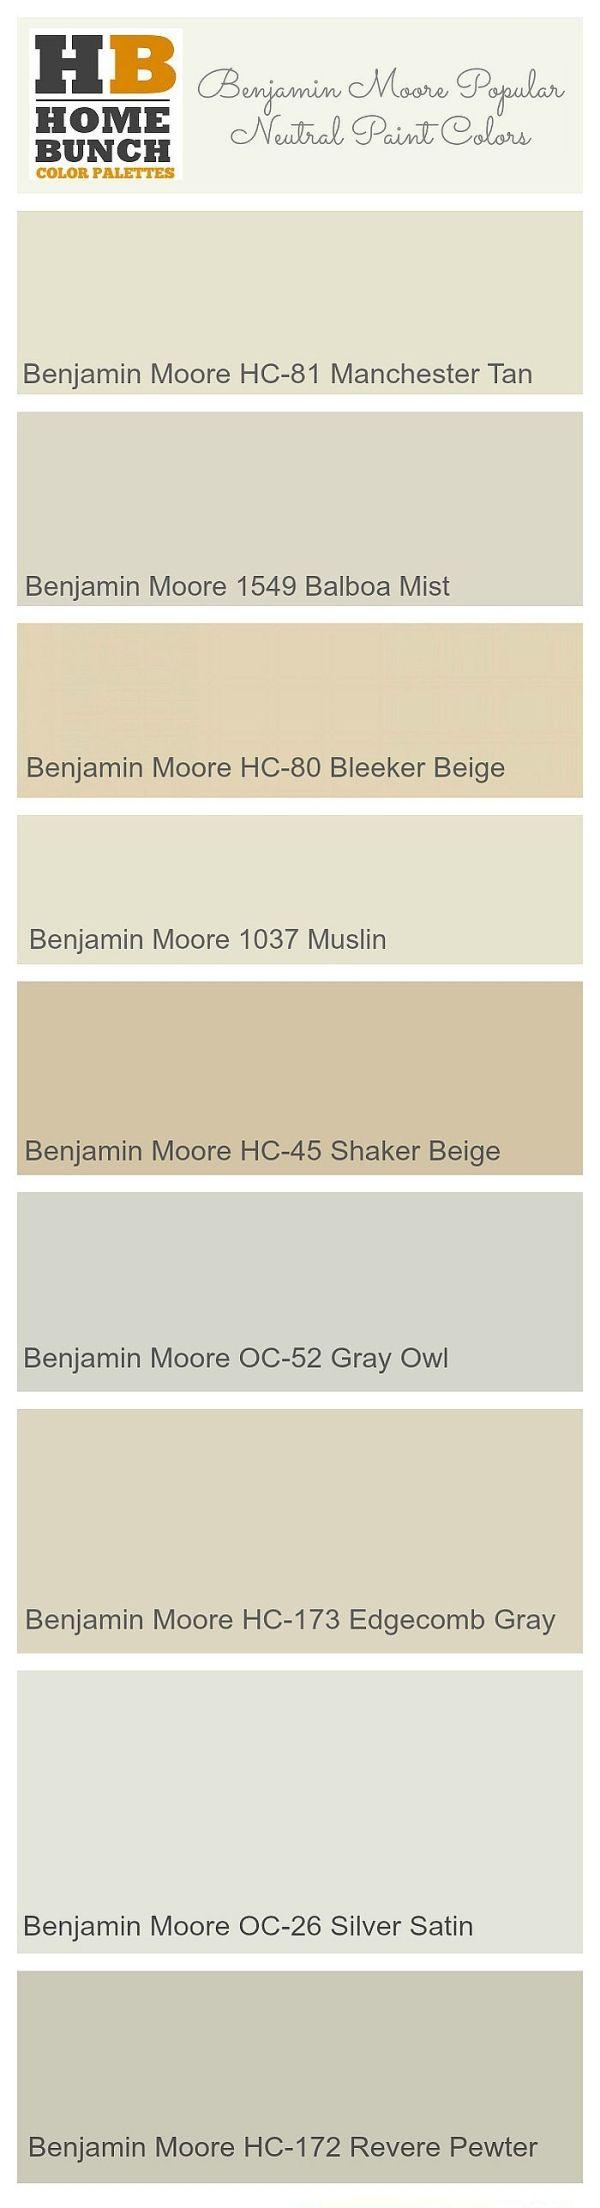 Benjamin moore lenox tan hc 44 - Benjamin Moore Popular Neutral Paint Colors Benjamin Moore Hc 81 Manchester Tan Benjamin